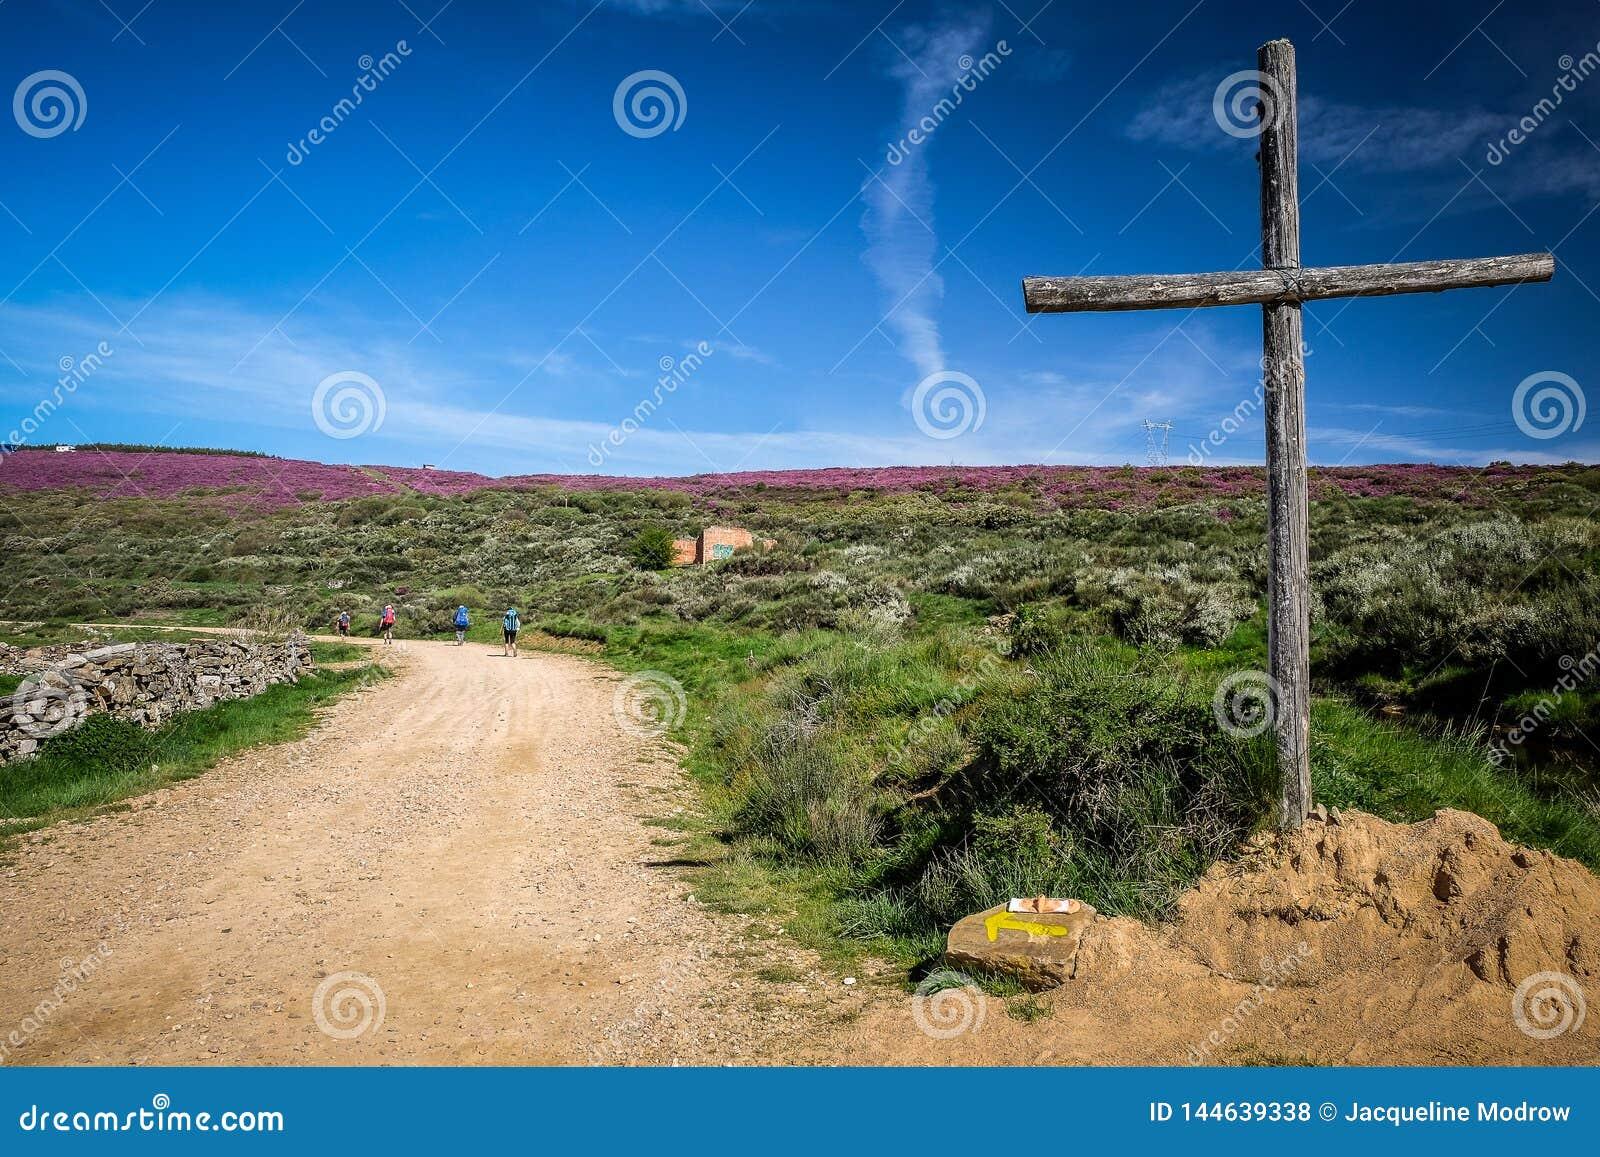 A cross marking The Way on the Camino Frances path to Santiago de Compostela